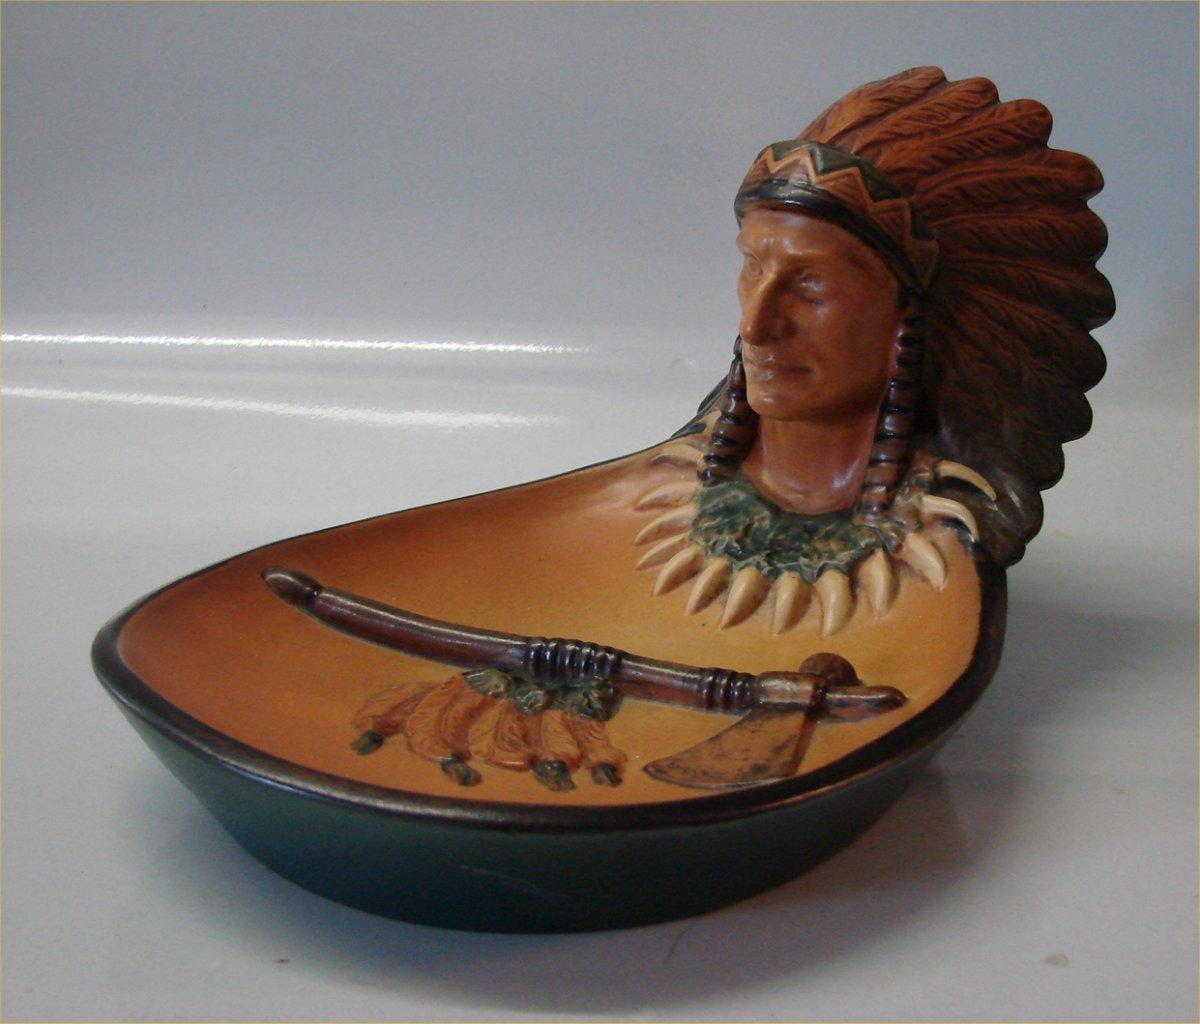 ipsens enke keramik P. Ipsens Enke Kgl. Hof. Terracottafabrik 1843 1955 Keramik Ibsen  ipsens enke keramik